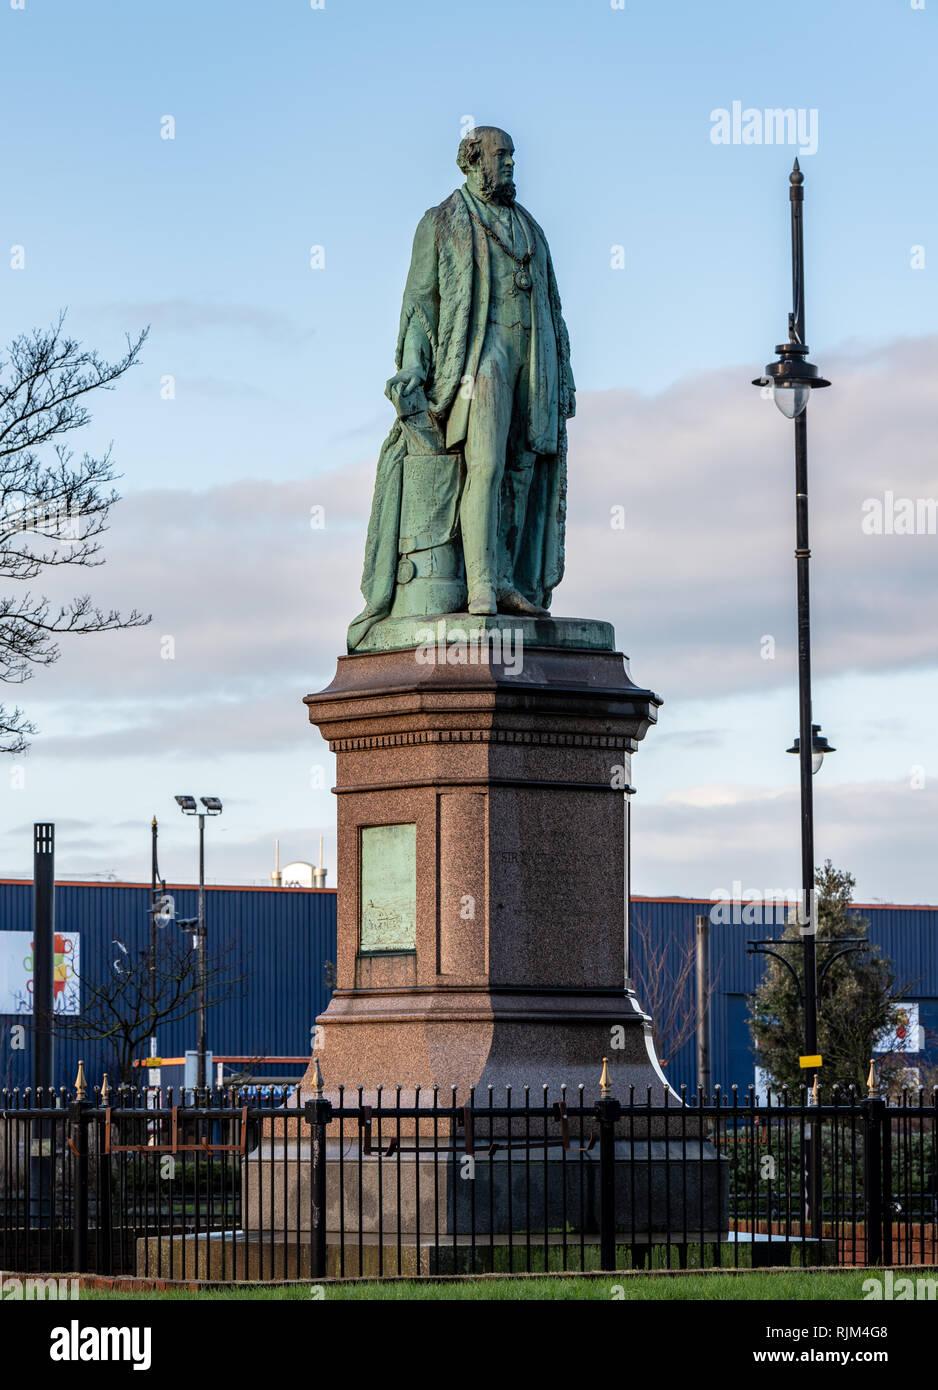 Sir James Ramsden Statue, Barrow in Furness Stock Photo